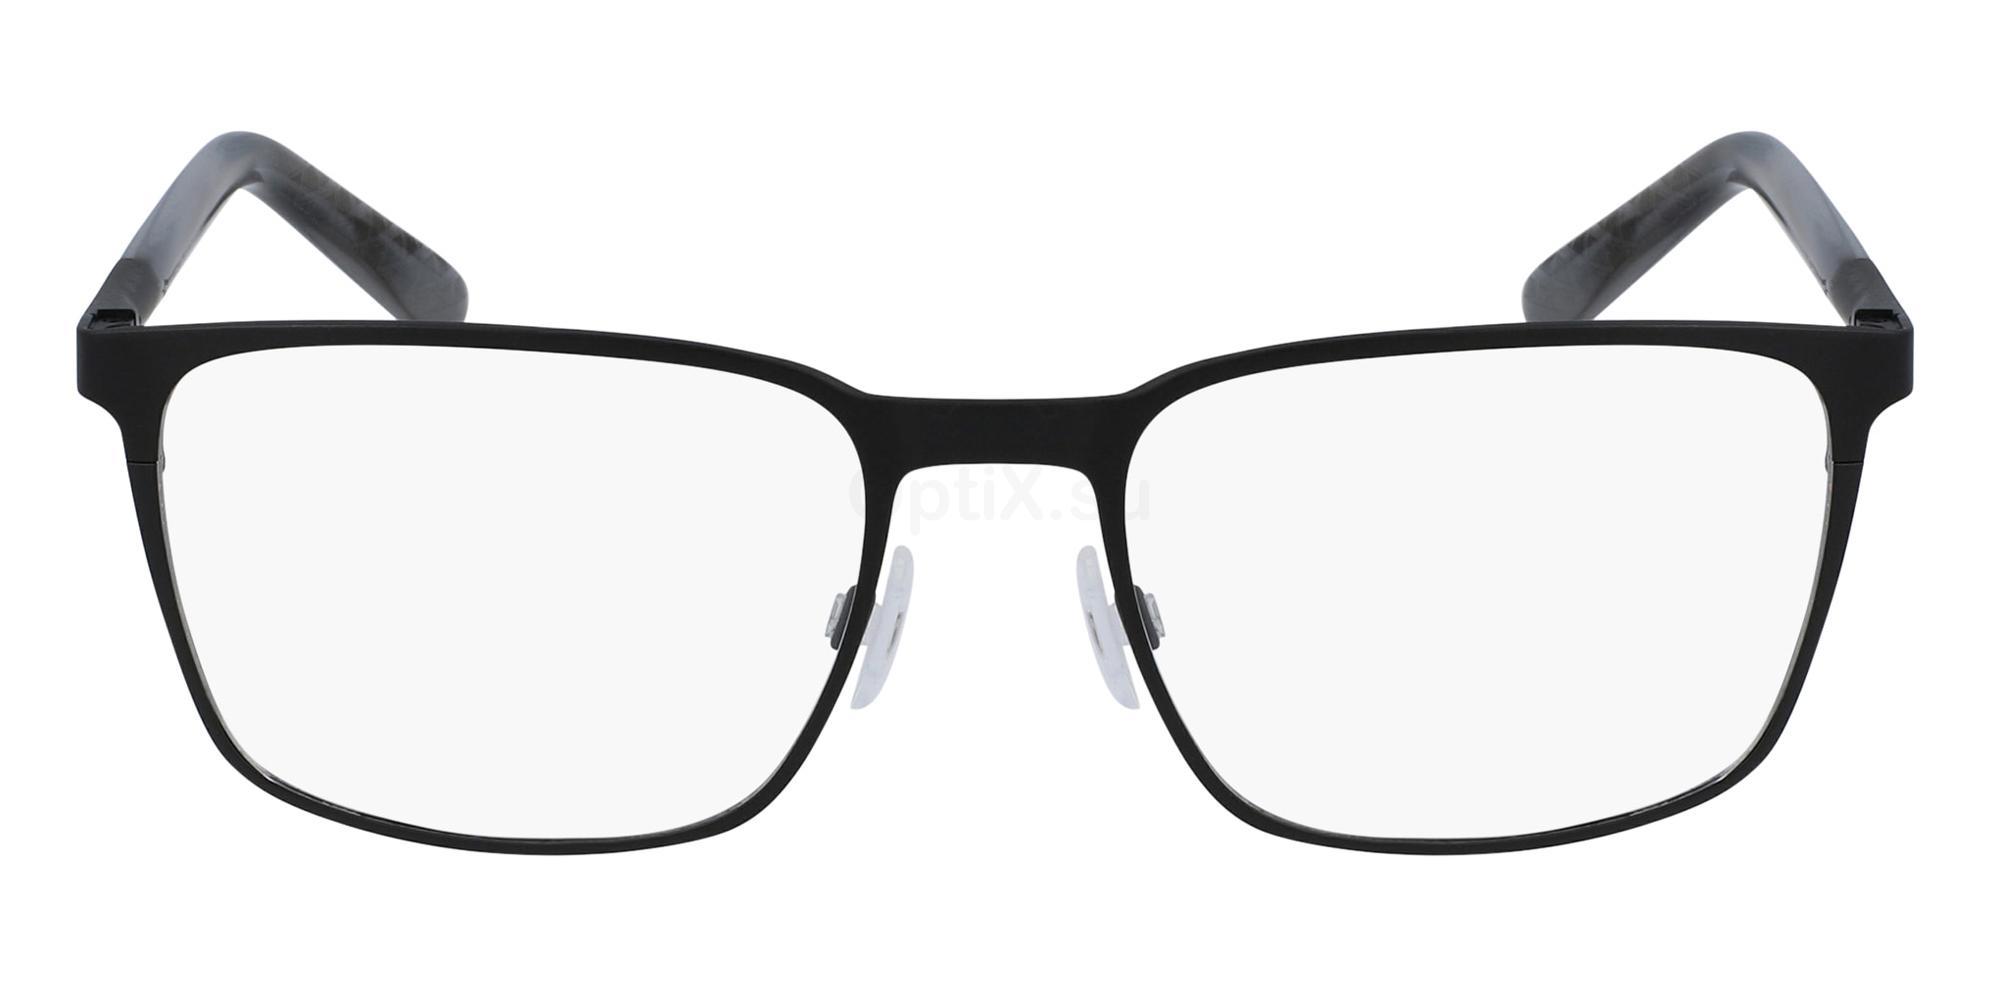 002 DR2016 Glasses, Dragon